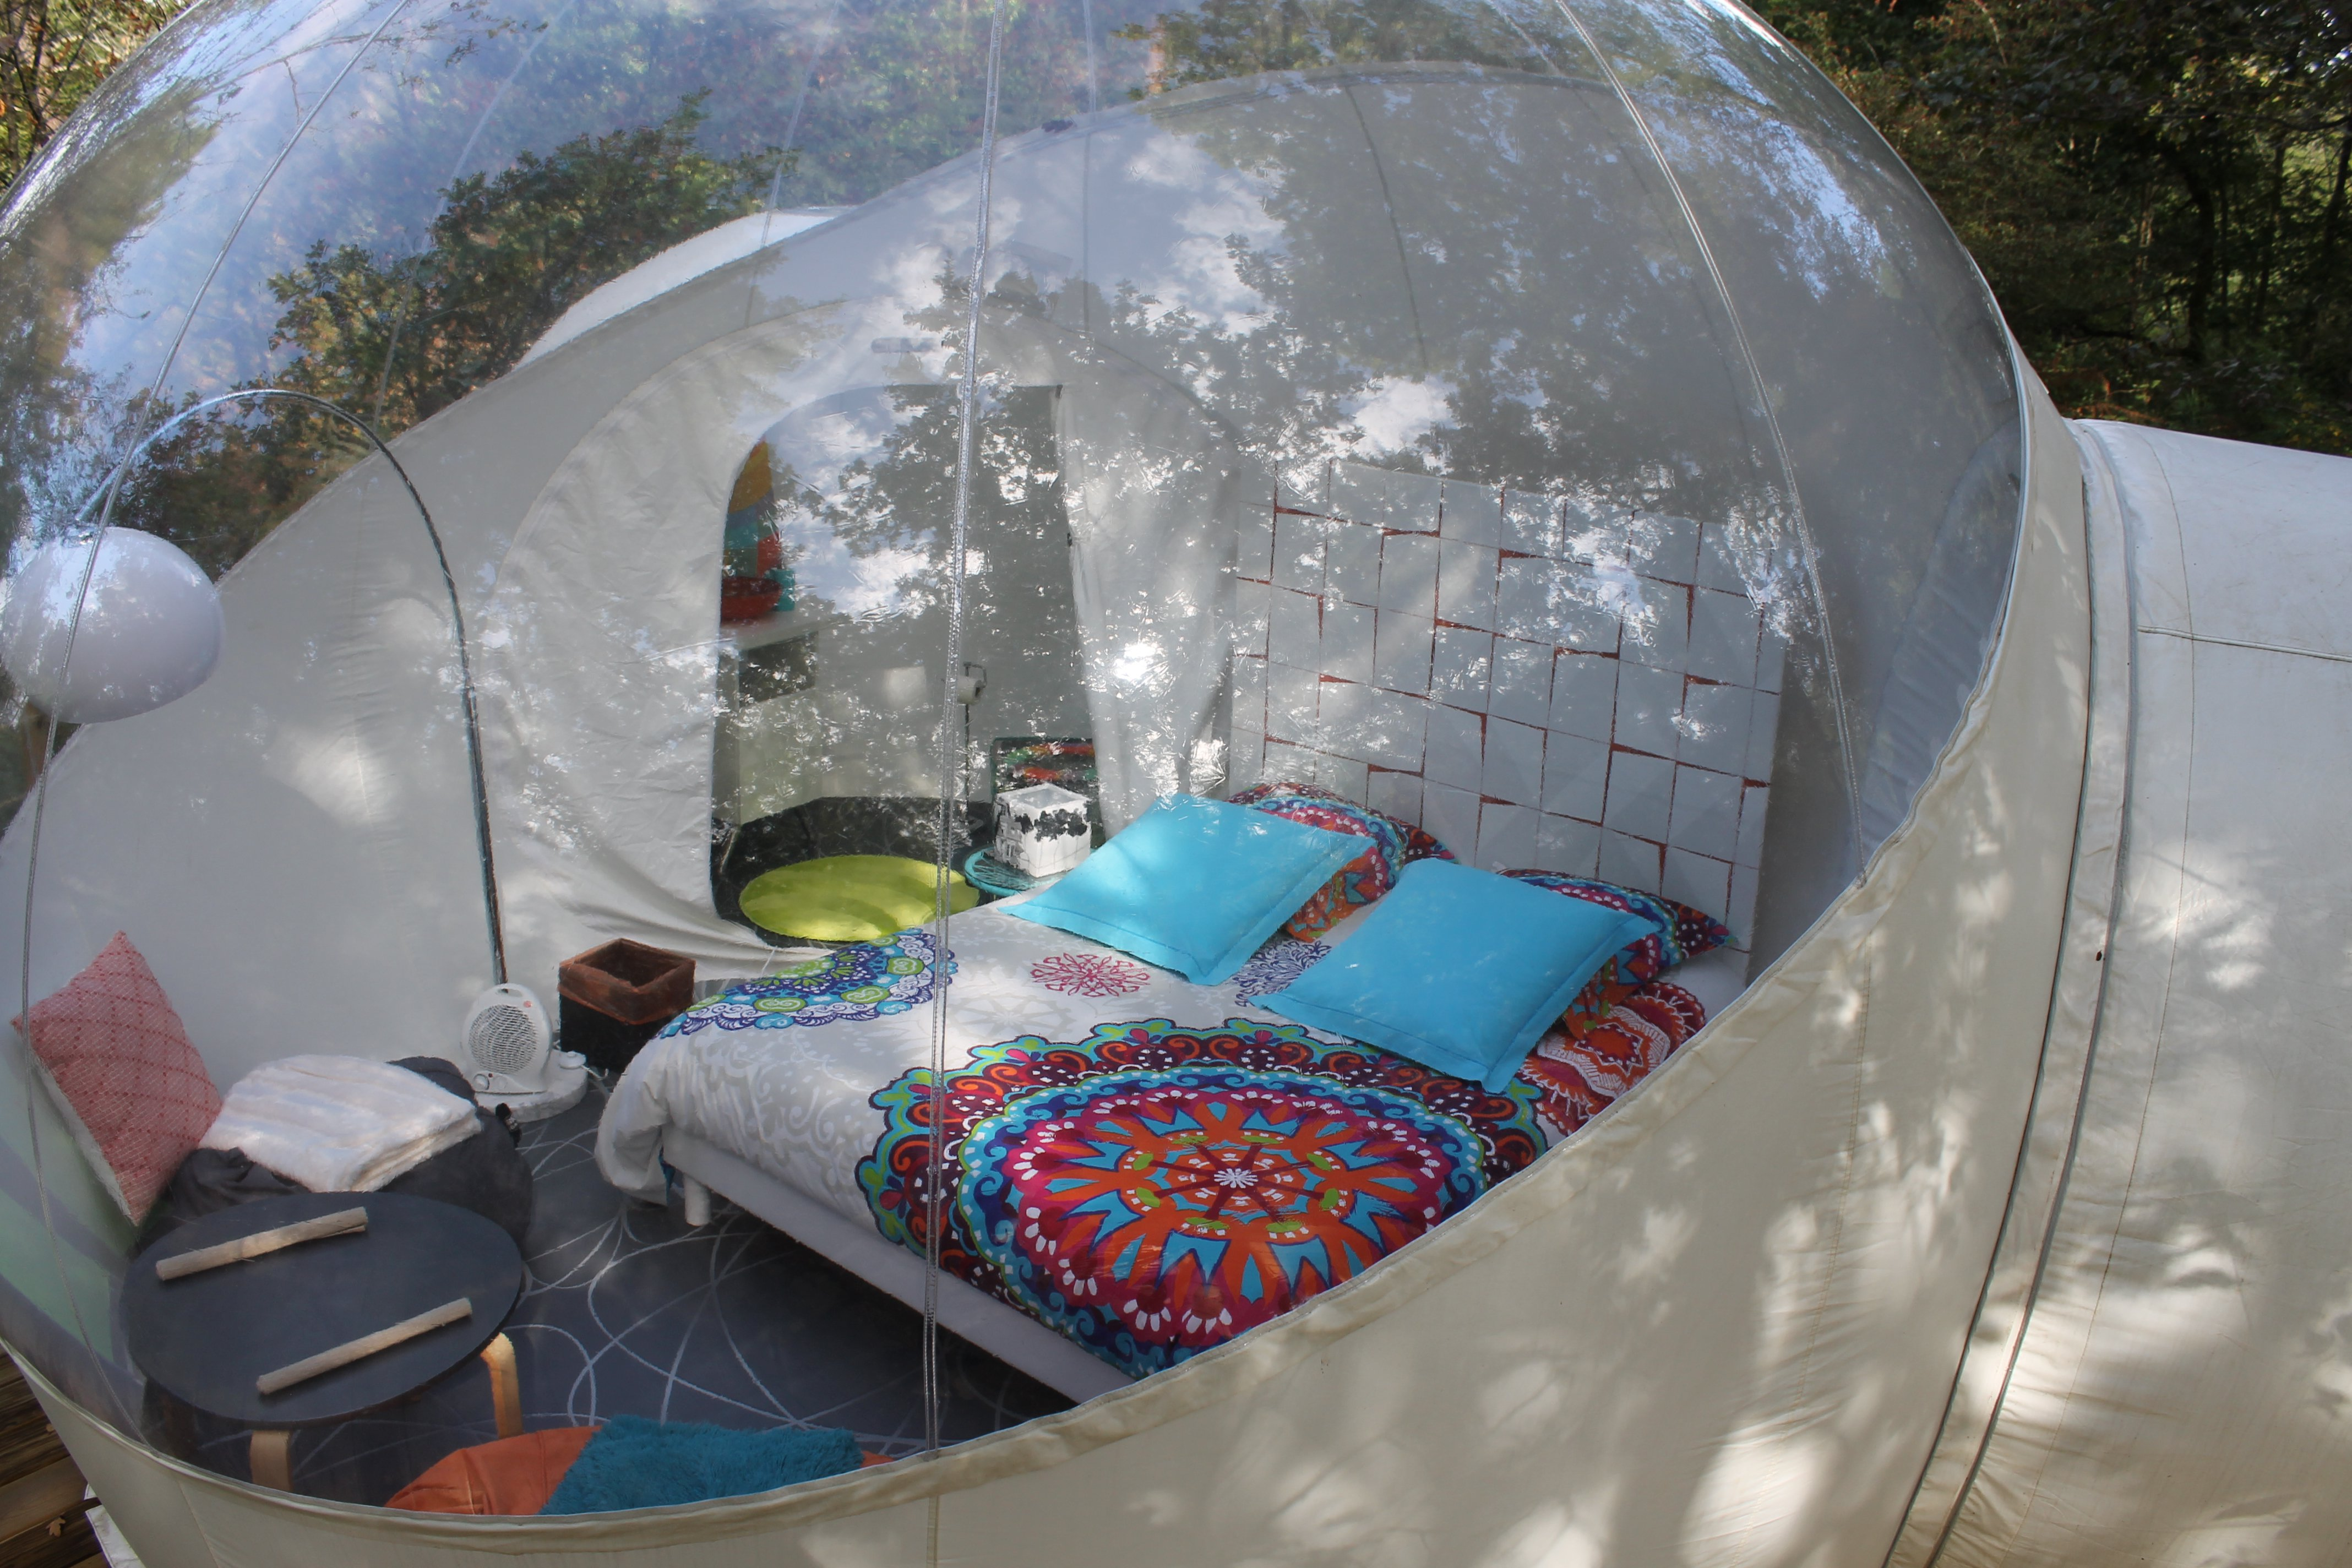 nuit insolite bulle normandie nuit dans une bulle insolite normandie la bulle toil e la bulle. Black Bedroom Furniture Sets. Home Design Ideas